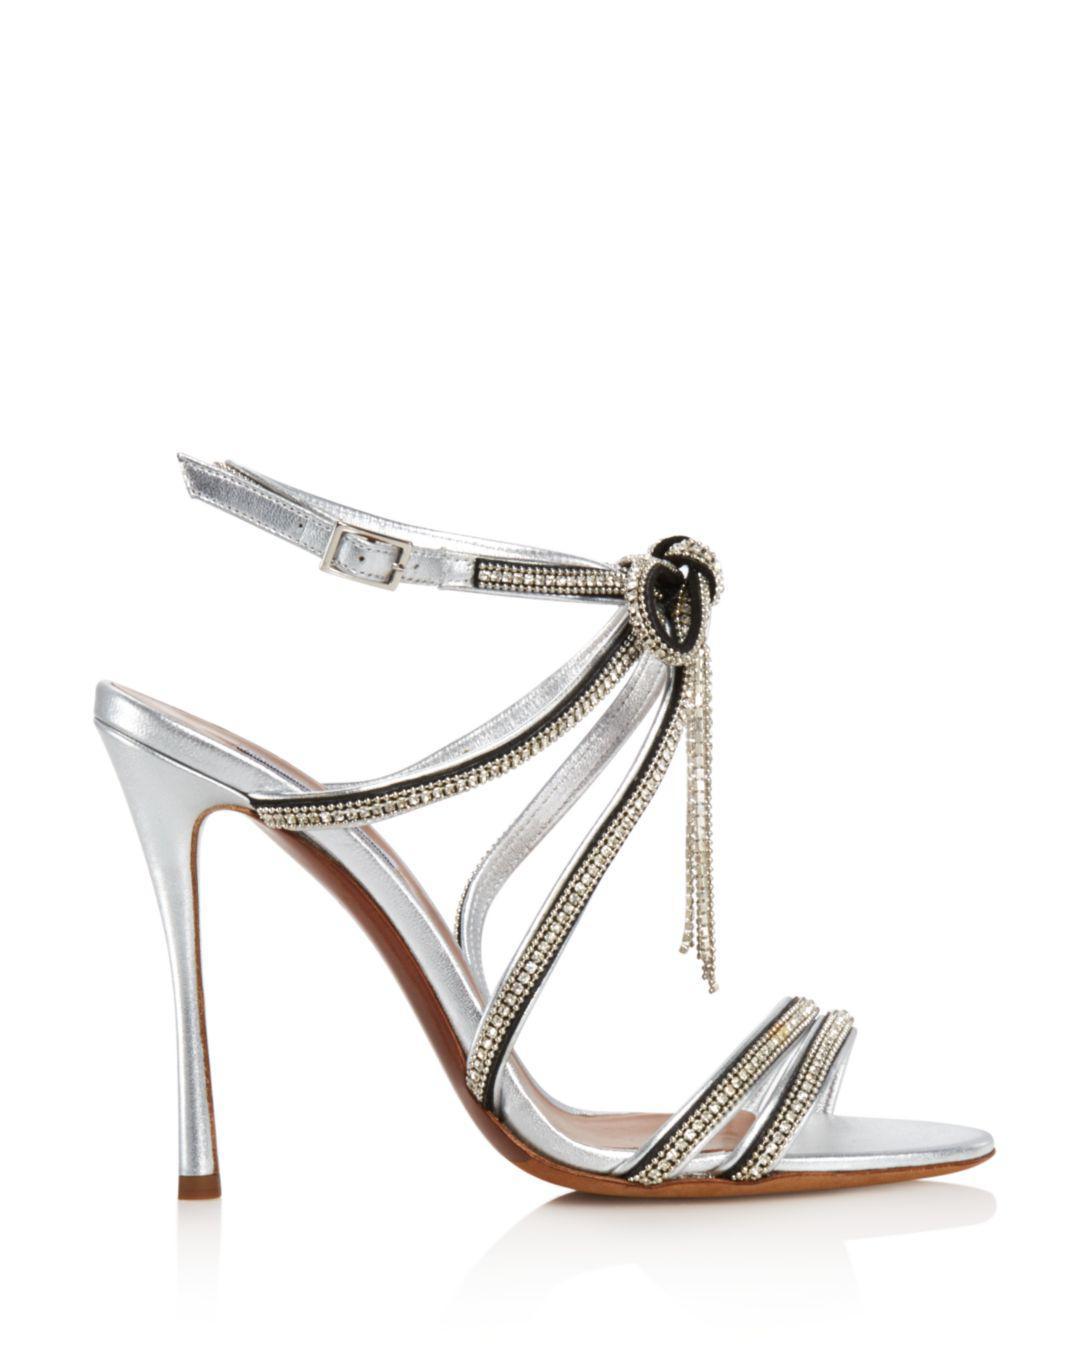 adae6f69d793 Lyst - Tabitha Simmons Women s Iceley Rhinestone Bow High-heel Sandals in  Metallic